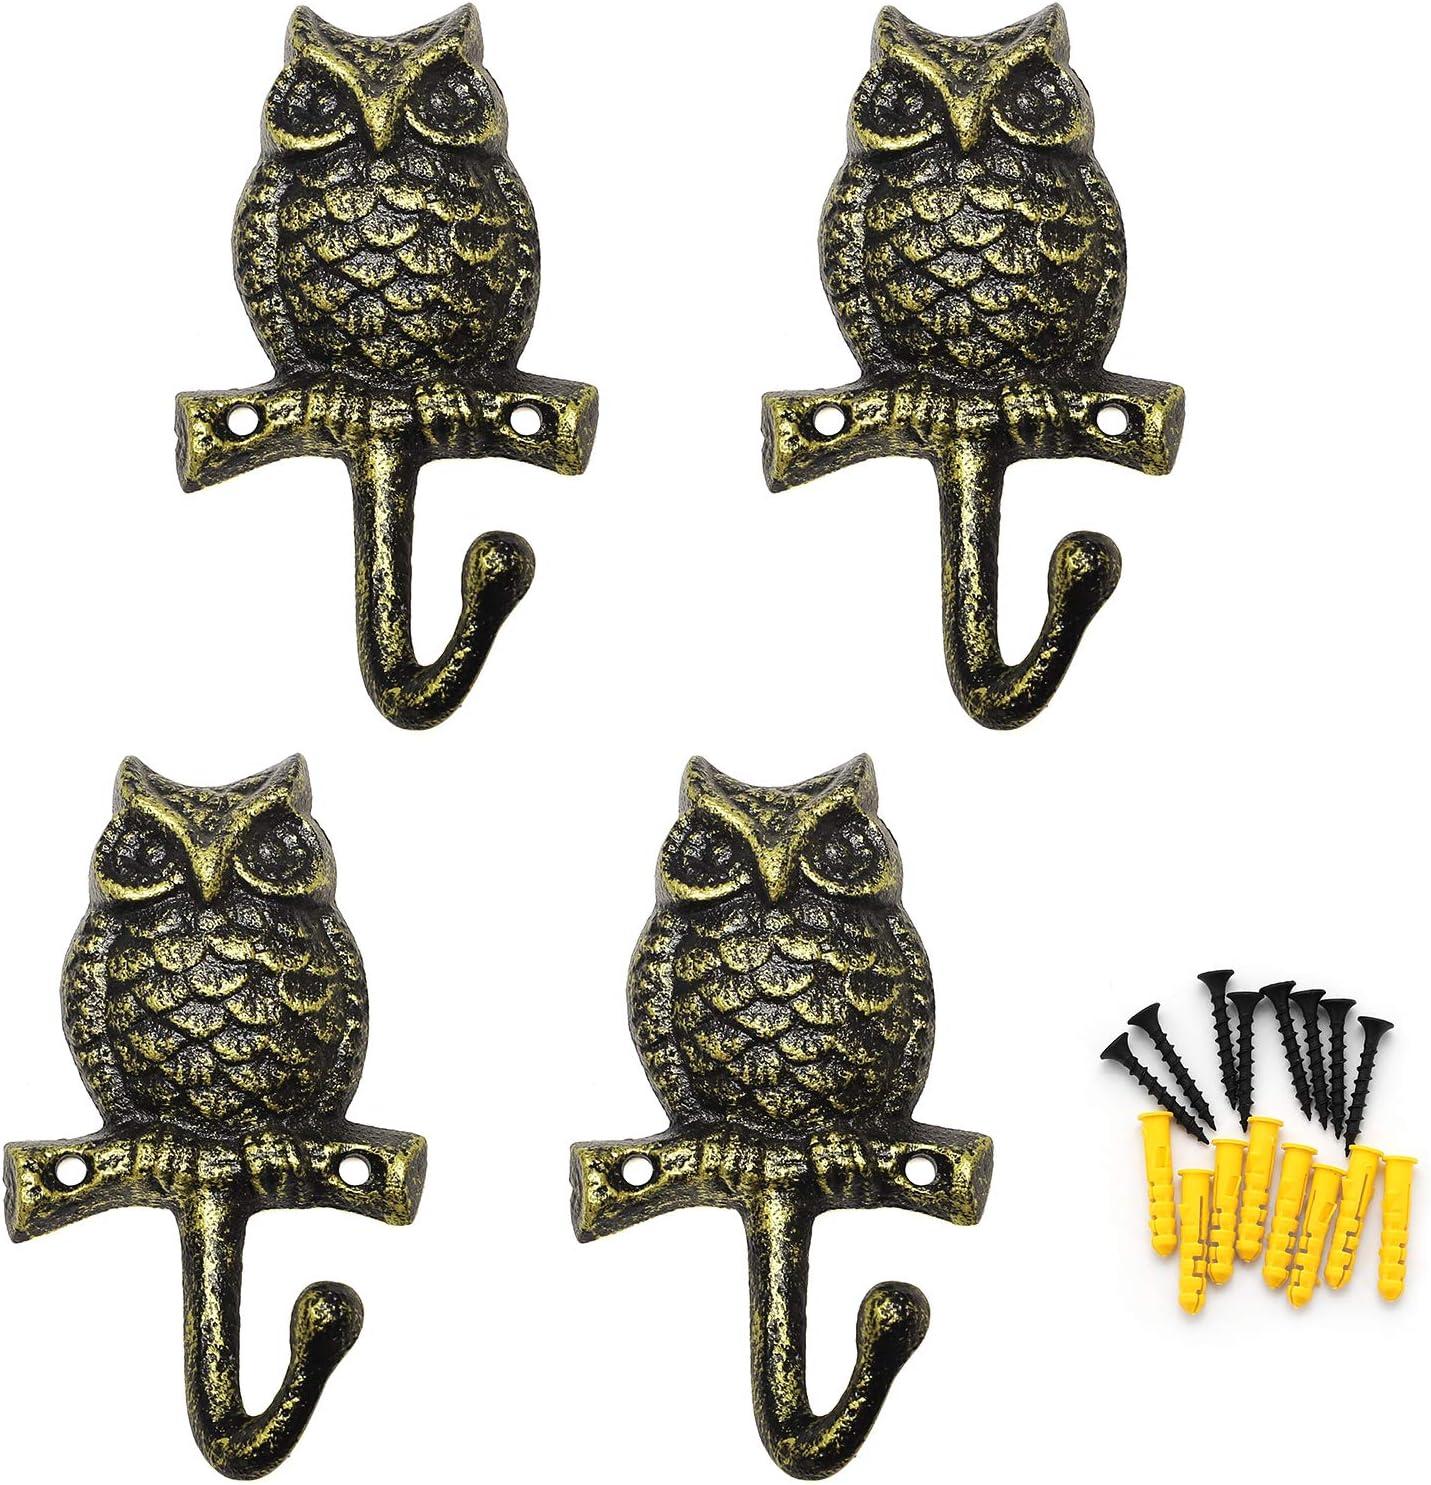 Coat Hooks Hanging Wall Mounted Rustic Decorative Owl Hook, Cast Iron 4 Inch Key Holder Wall Decor, Set of 4